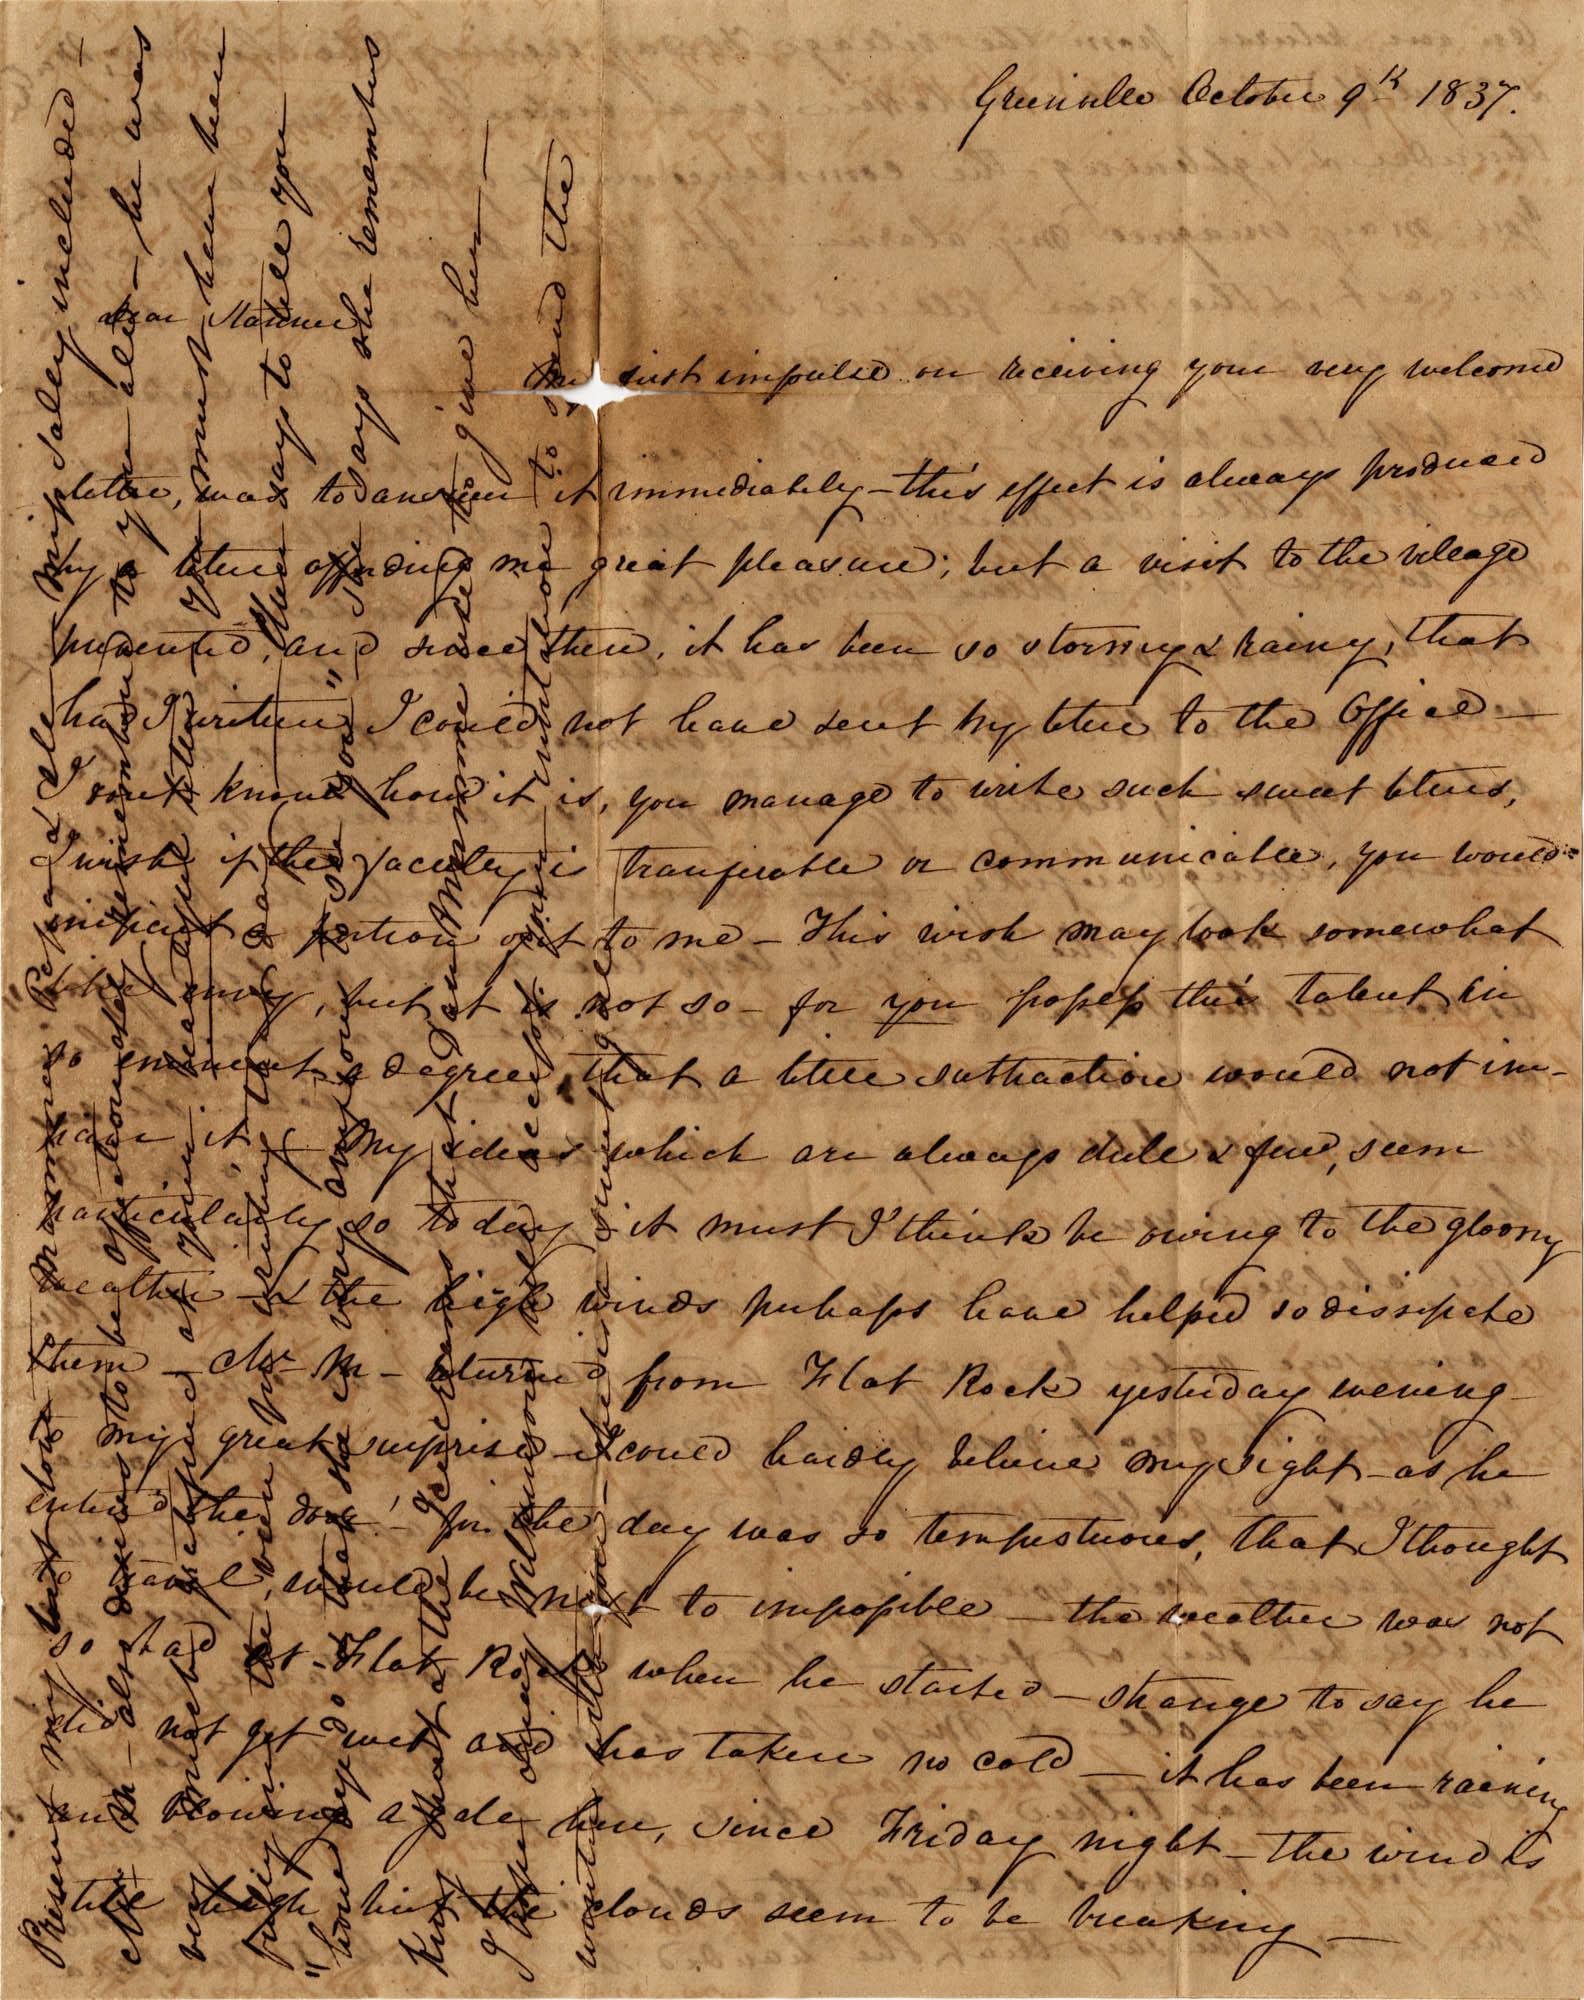 022. Mary Wilkinson Memminger to Anna Wilkinson -- October 9, 1837